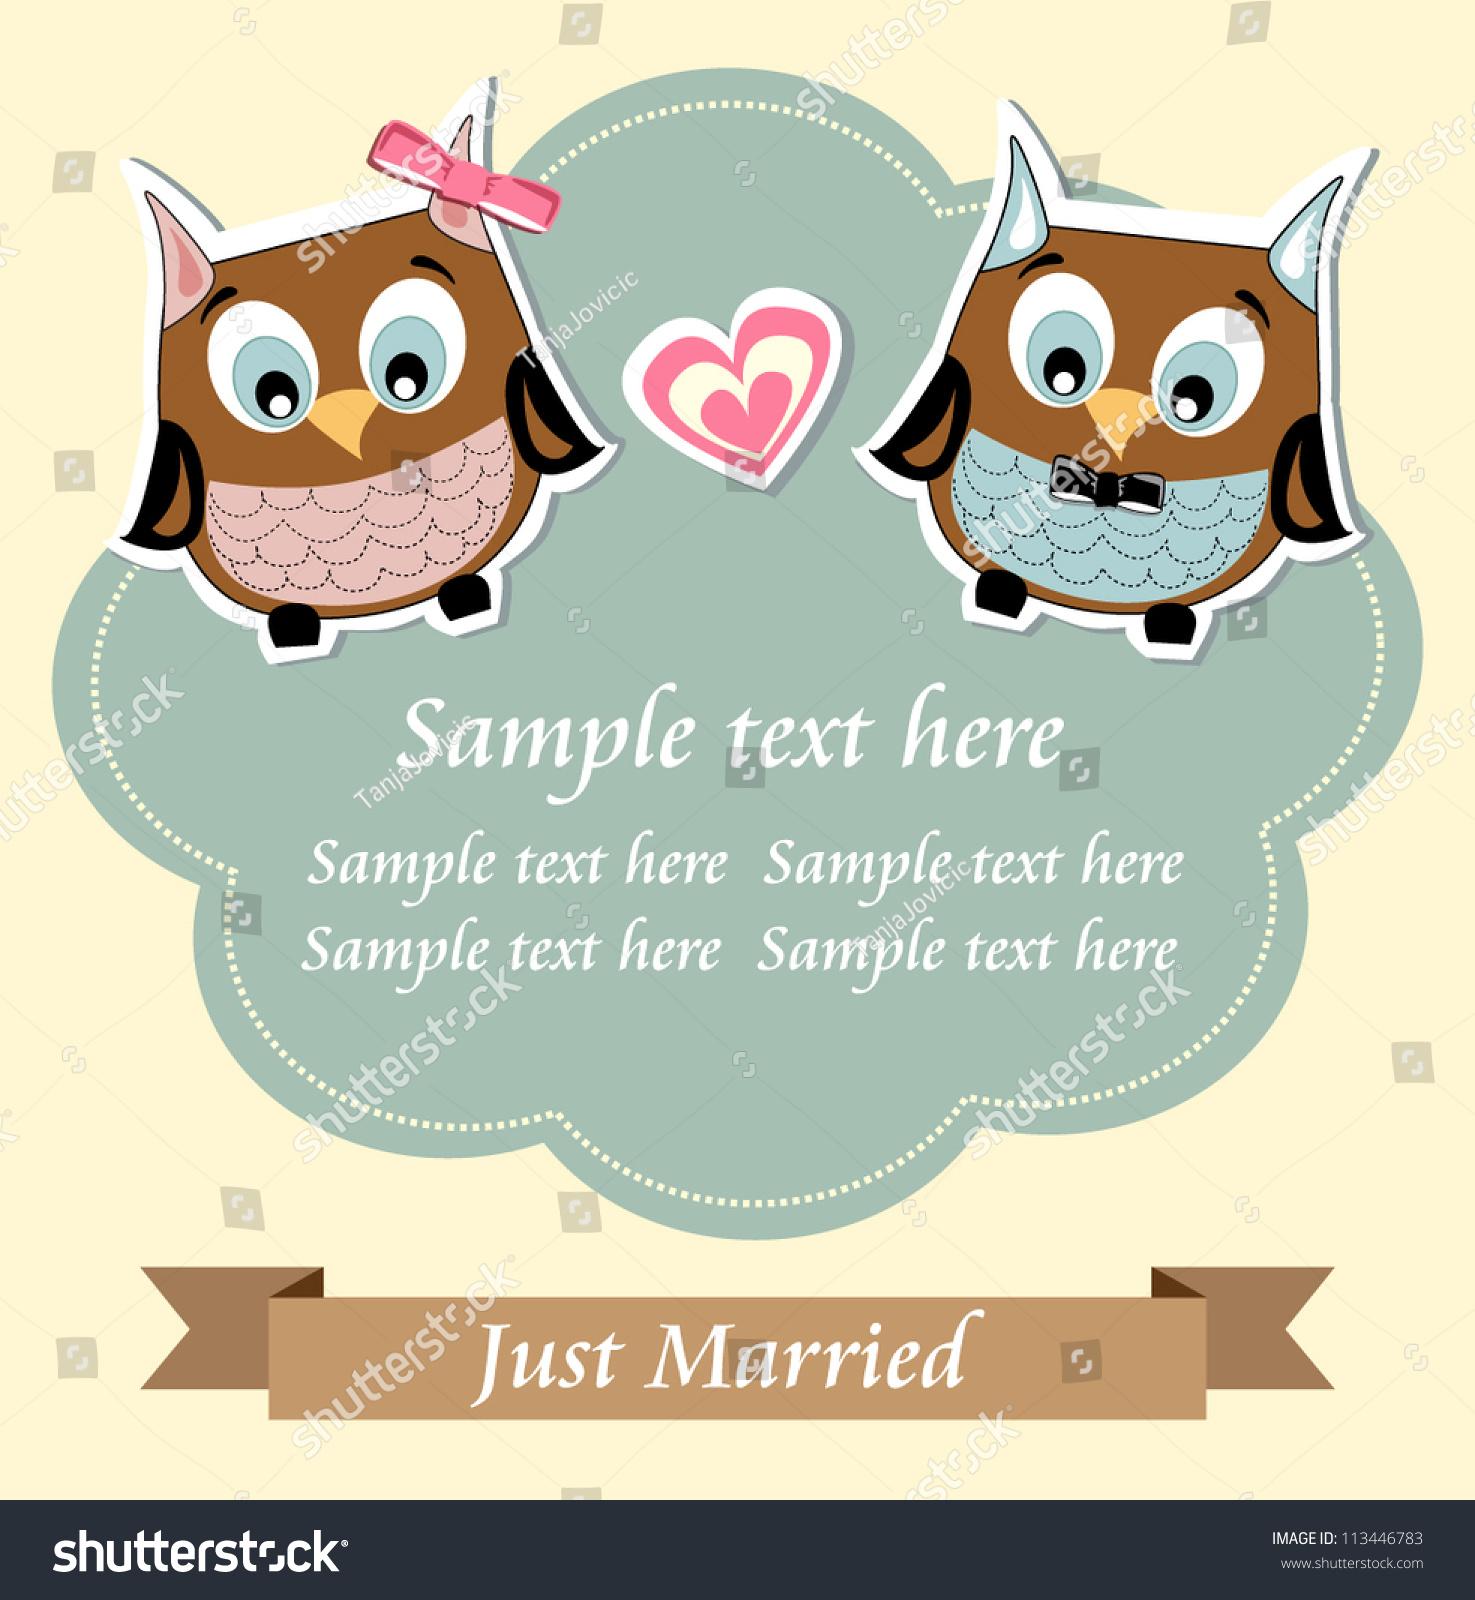 Cute owls just married wedding invitation stock vector 113446783 cute owls just married wedding invitation card stopboris Choice Image